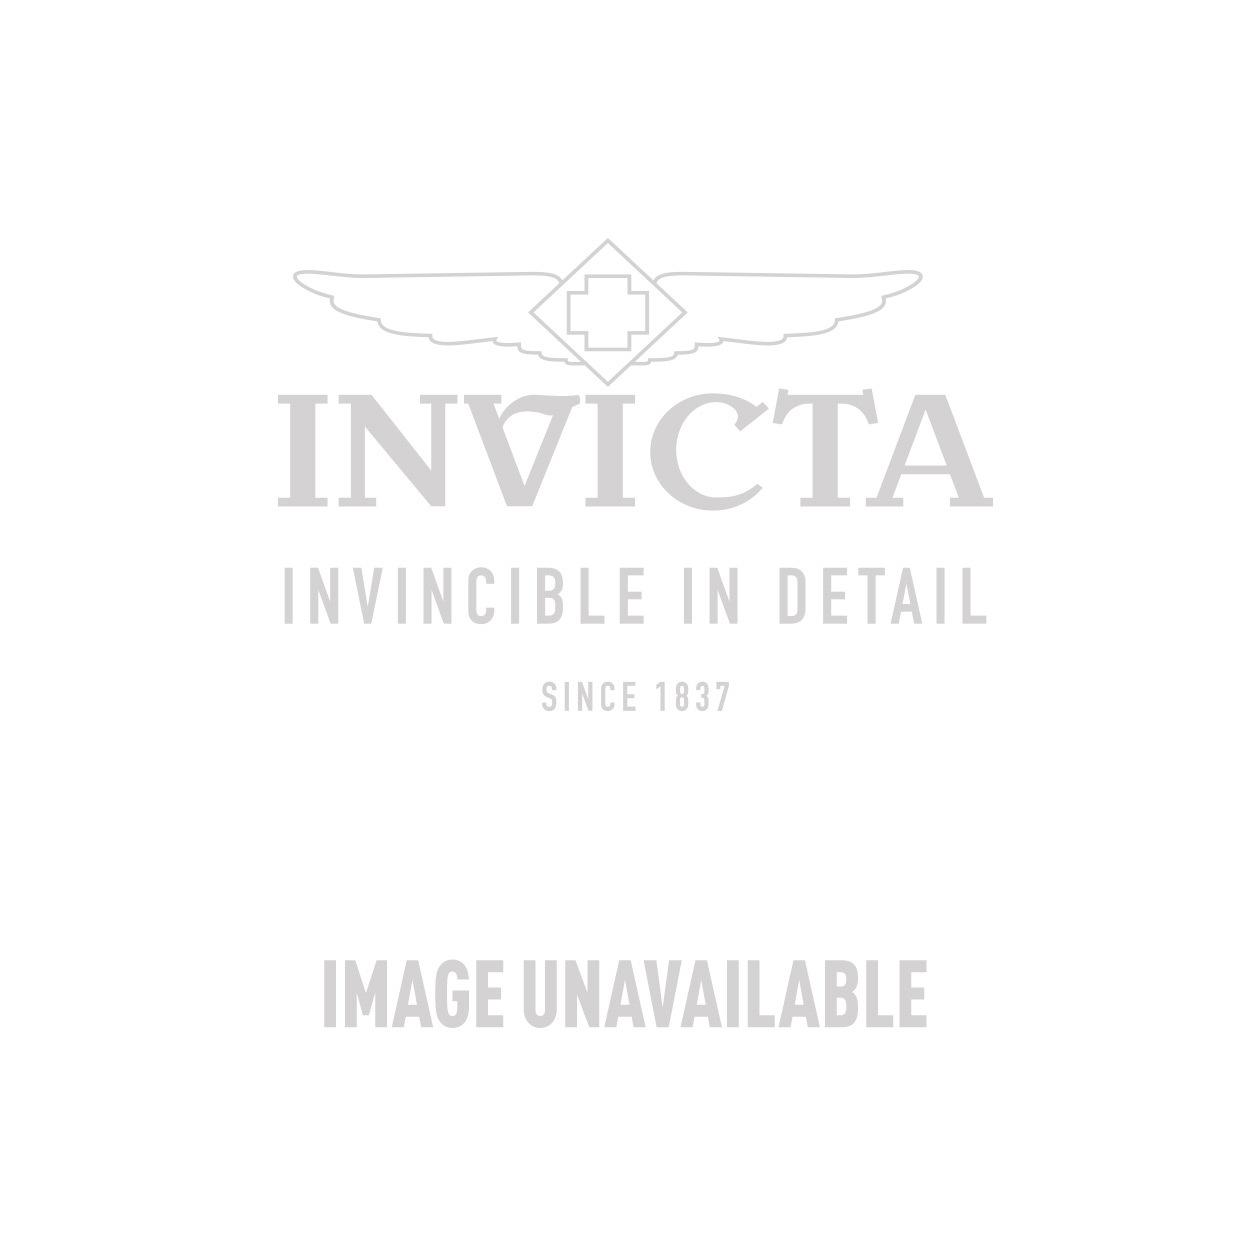 Invicta Bolt Zeus Quartz Watch - Gold, Gunmetal case with Gold, Gunmetal  tone Stainless